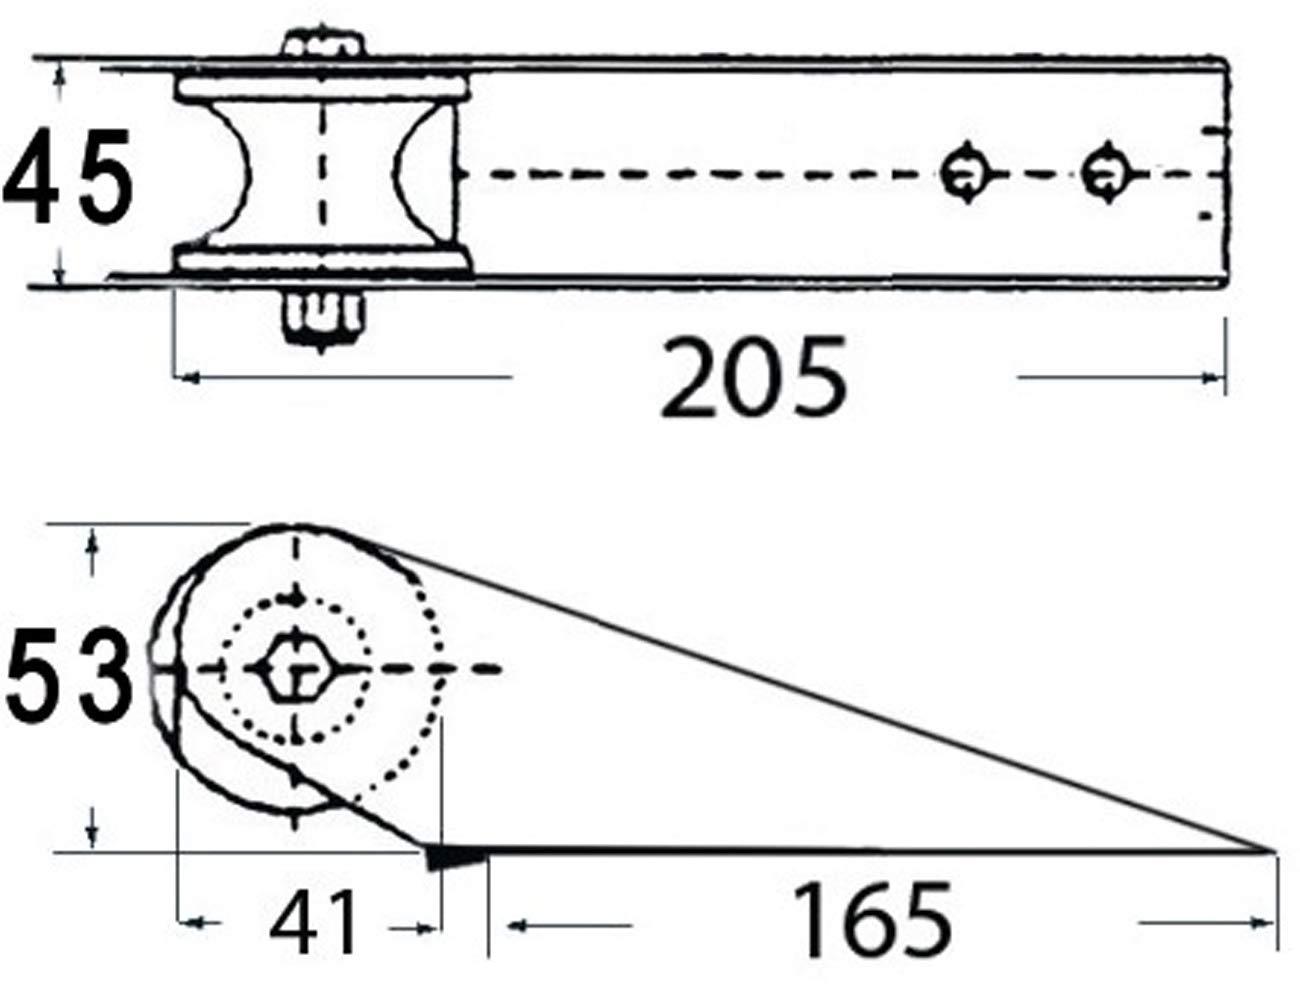 Osculati Edelstahl Bugrolle f/ür kleine Boote 205mm L/änge